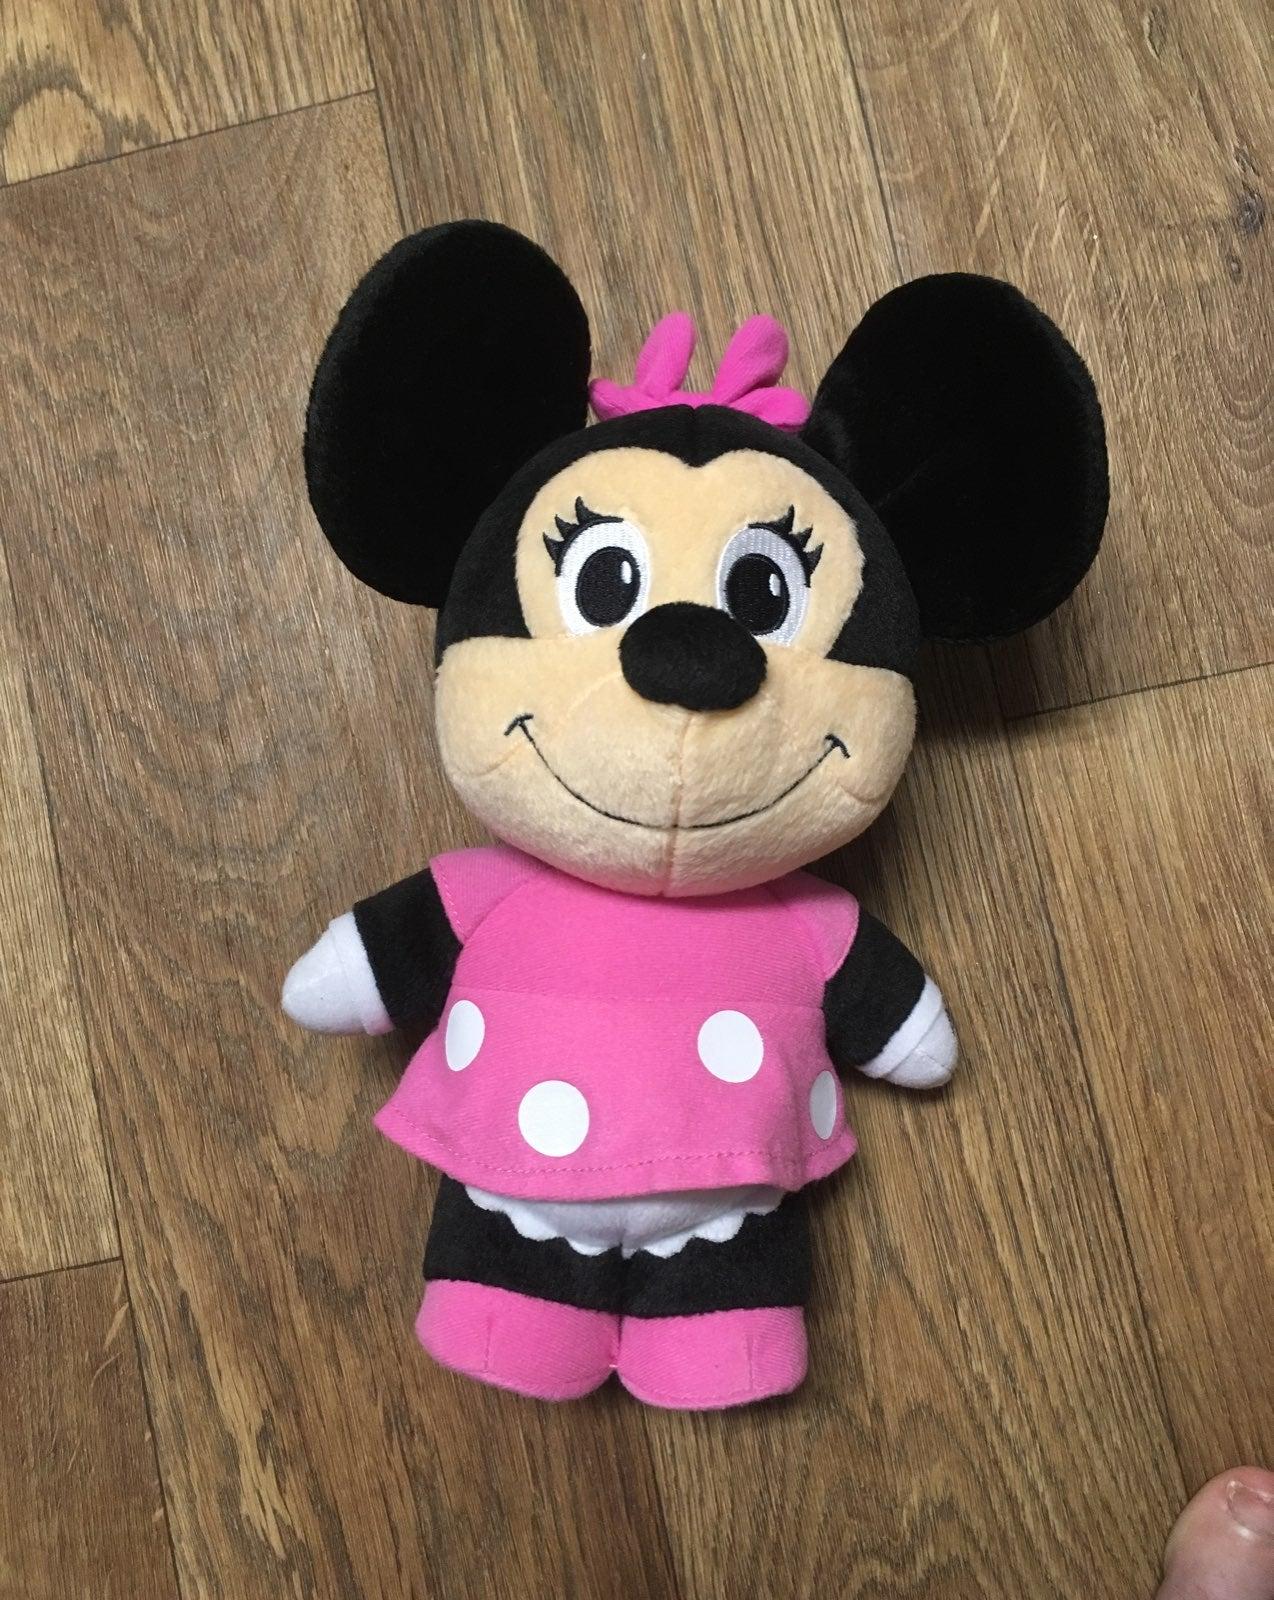 Talking Minnie Mouse